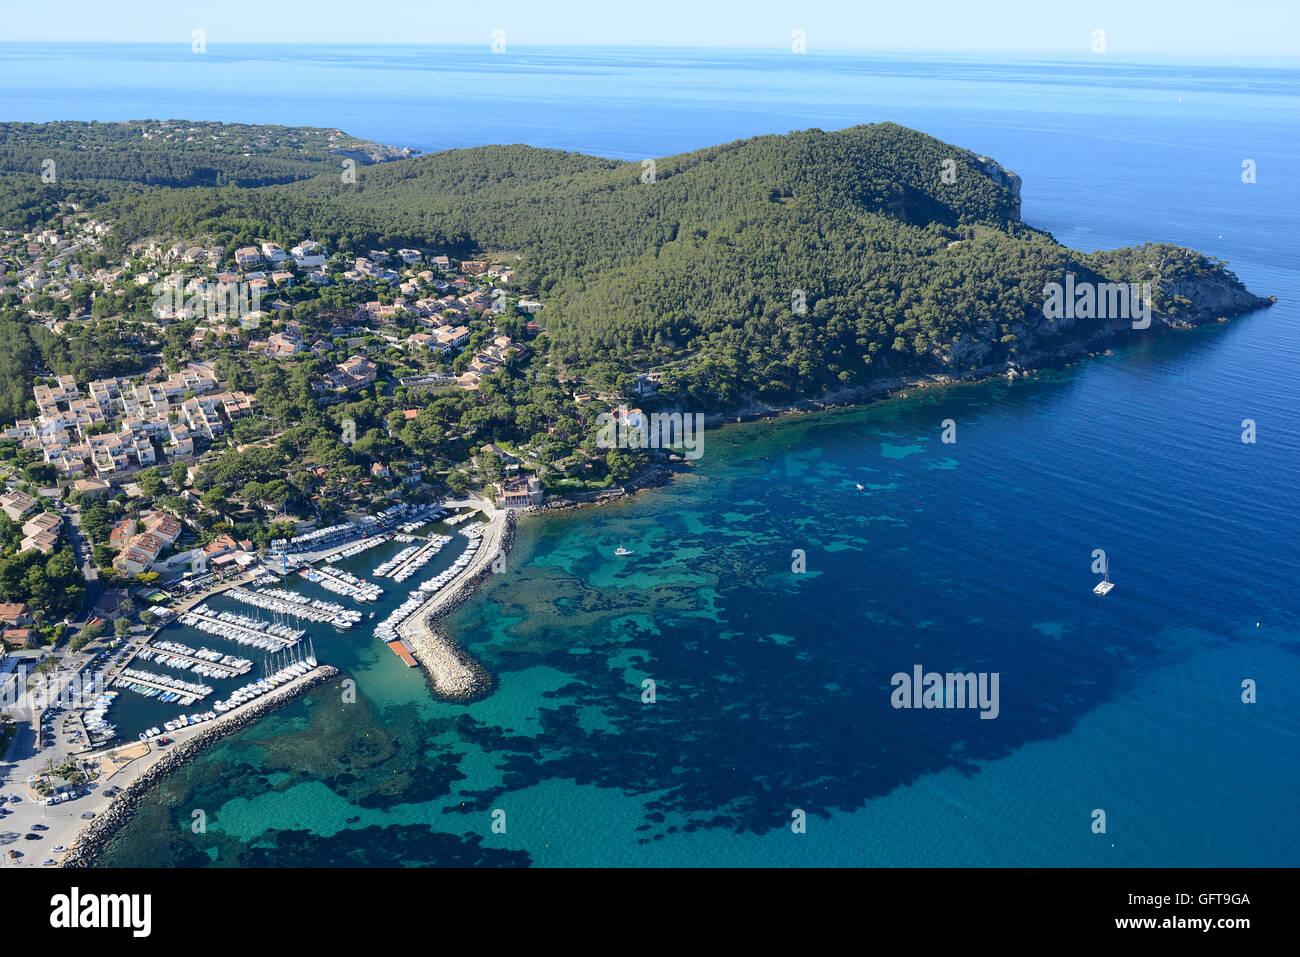 SMALL MARINA AND WOODY PENINSULA (aerial view). La Madrague Marina, Saint-Cyr-sur-Mer, Var, Provence, France. Stock Photo